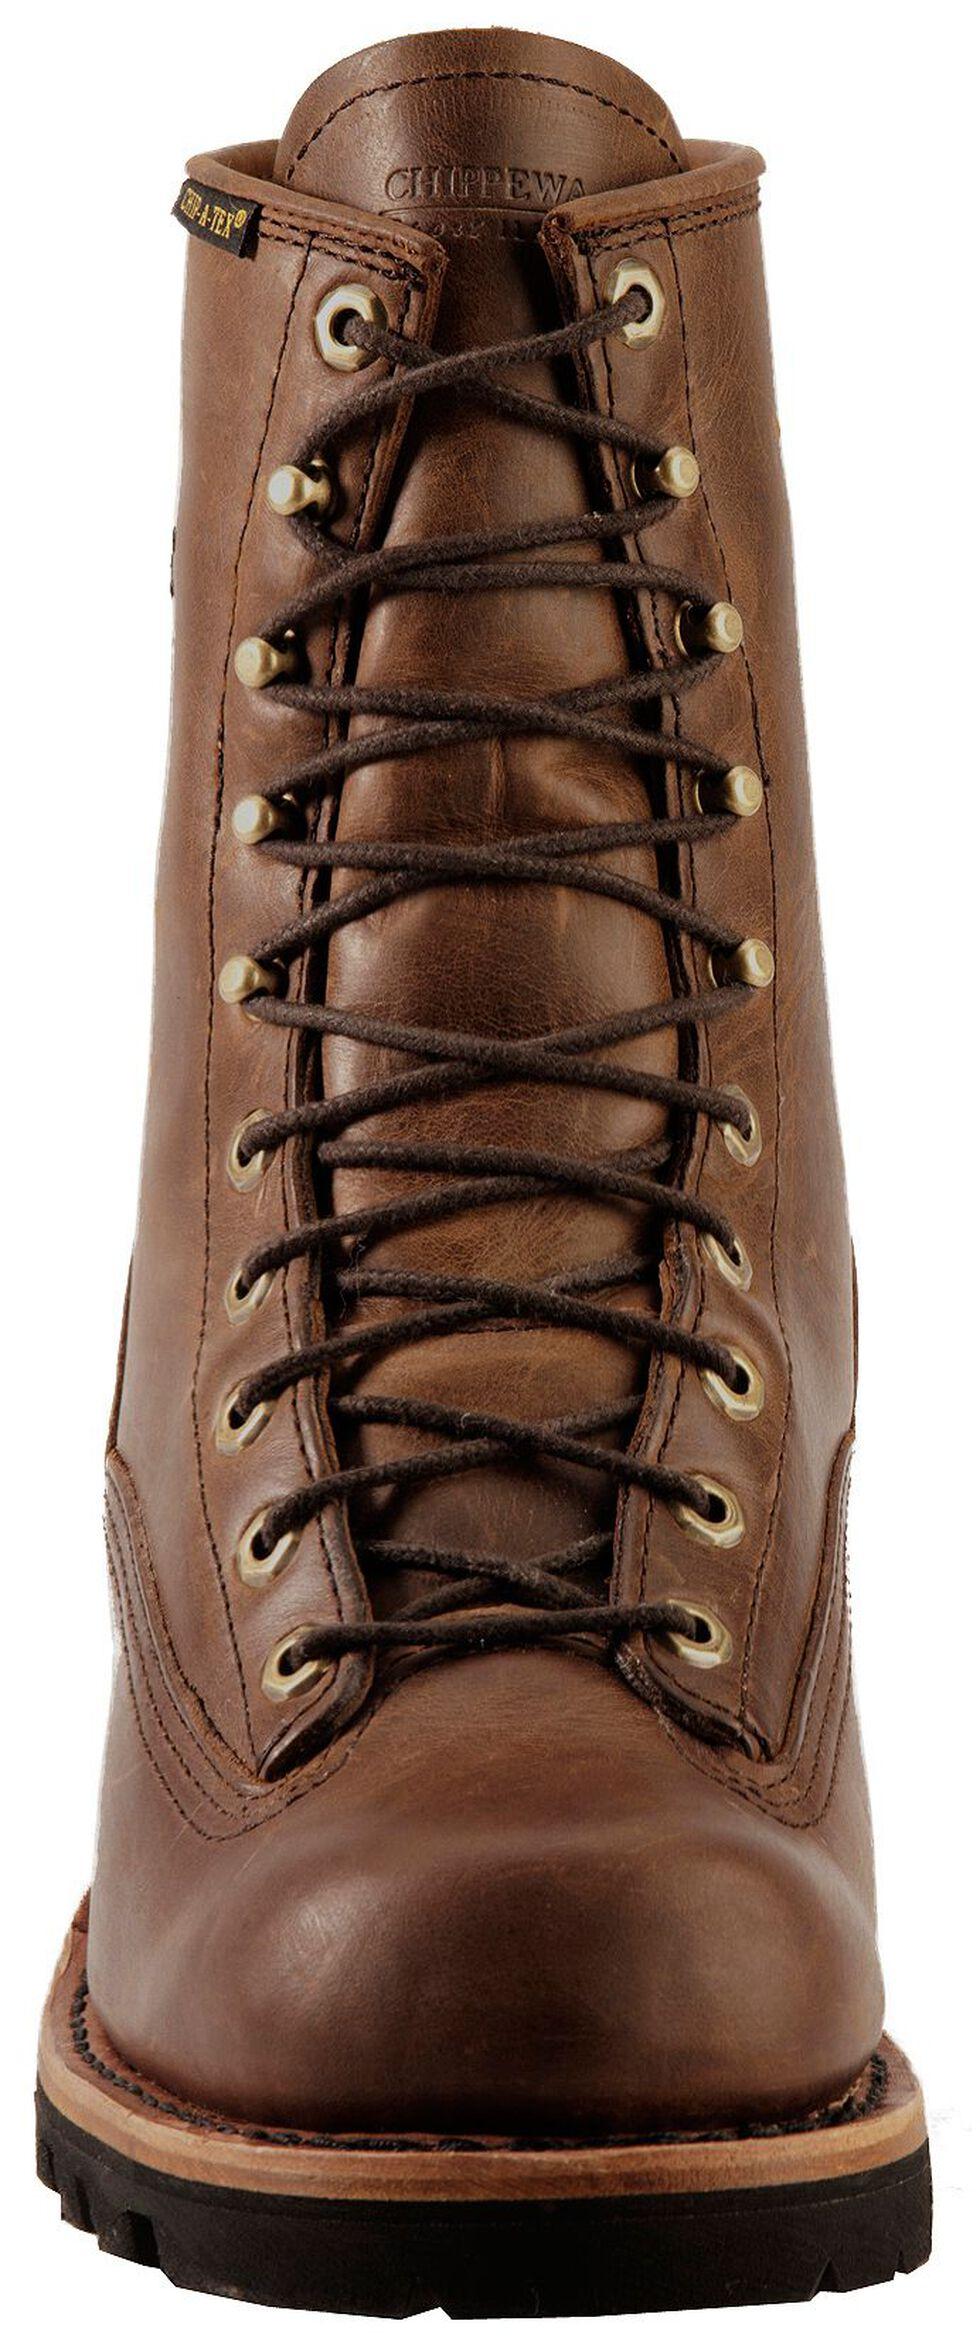 "Chippewa Lace-Up Waterproof 8"" Logger Boots - Steel Toe, Bay Apache, hi-res"